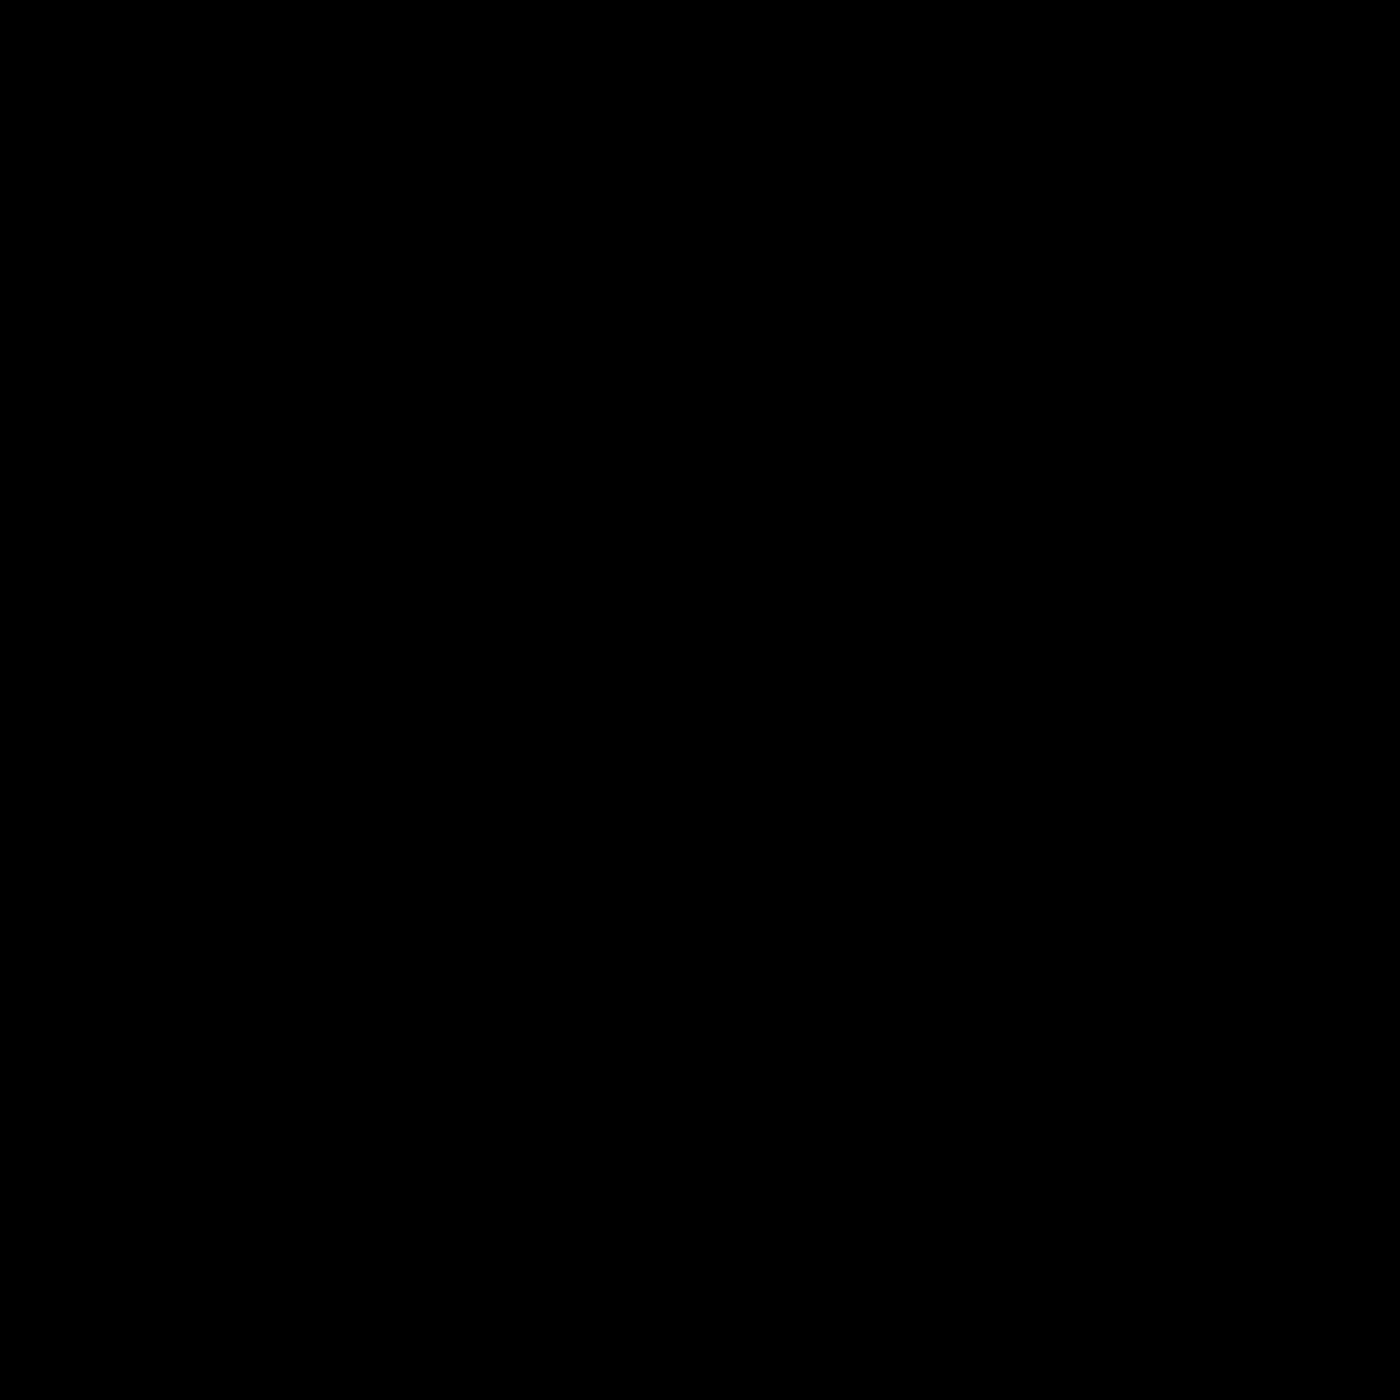 Pratikte Dijital Eğitim, Post-Corona Serisi XIII